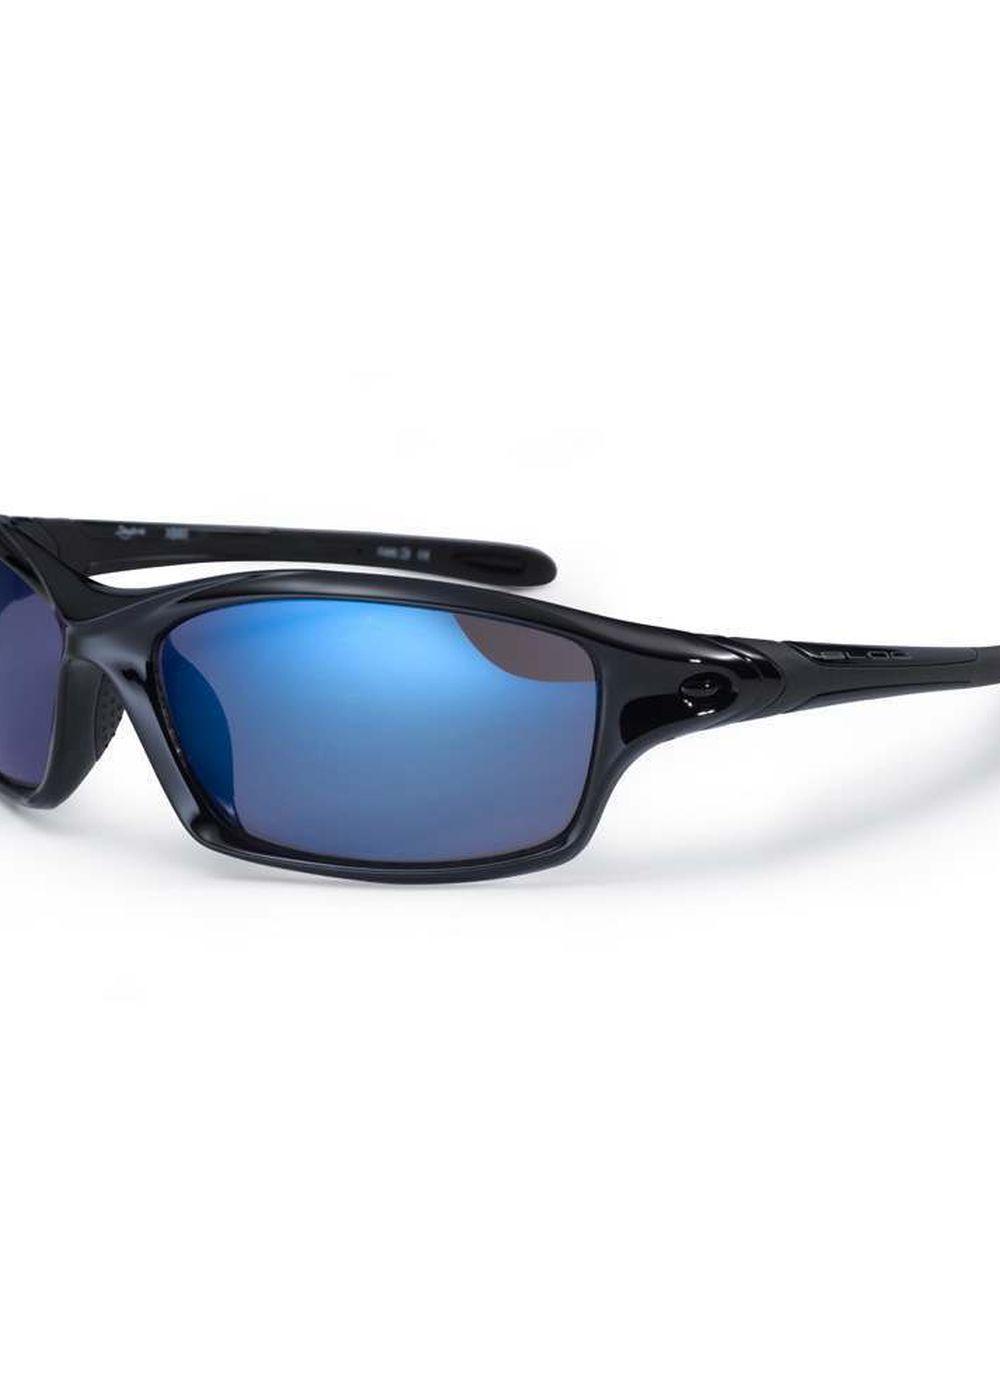 BLOC DAYTONA SUNGLASSES Shiny Black/Blue Mirror